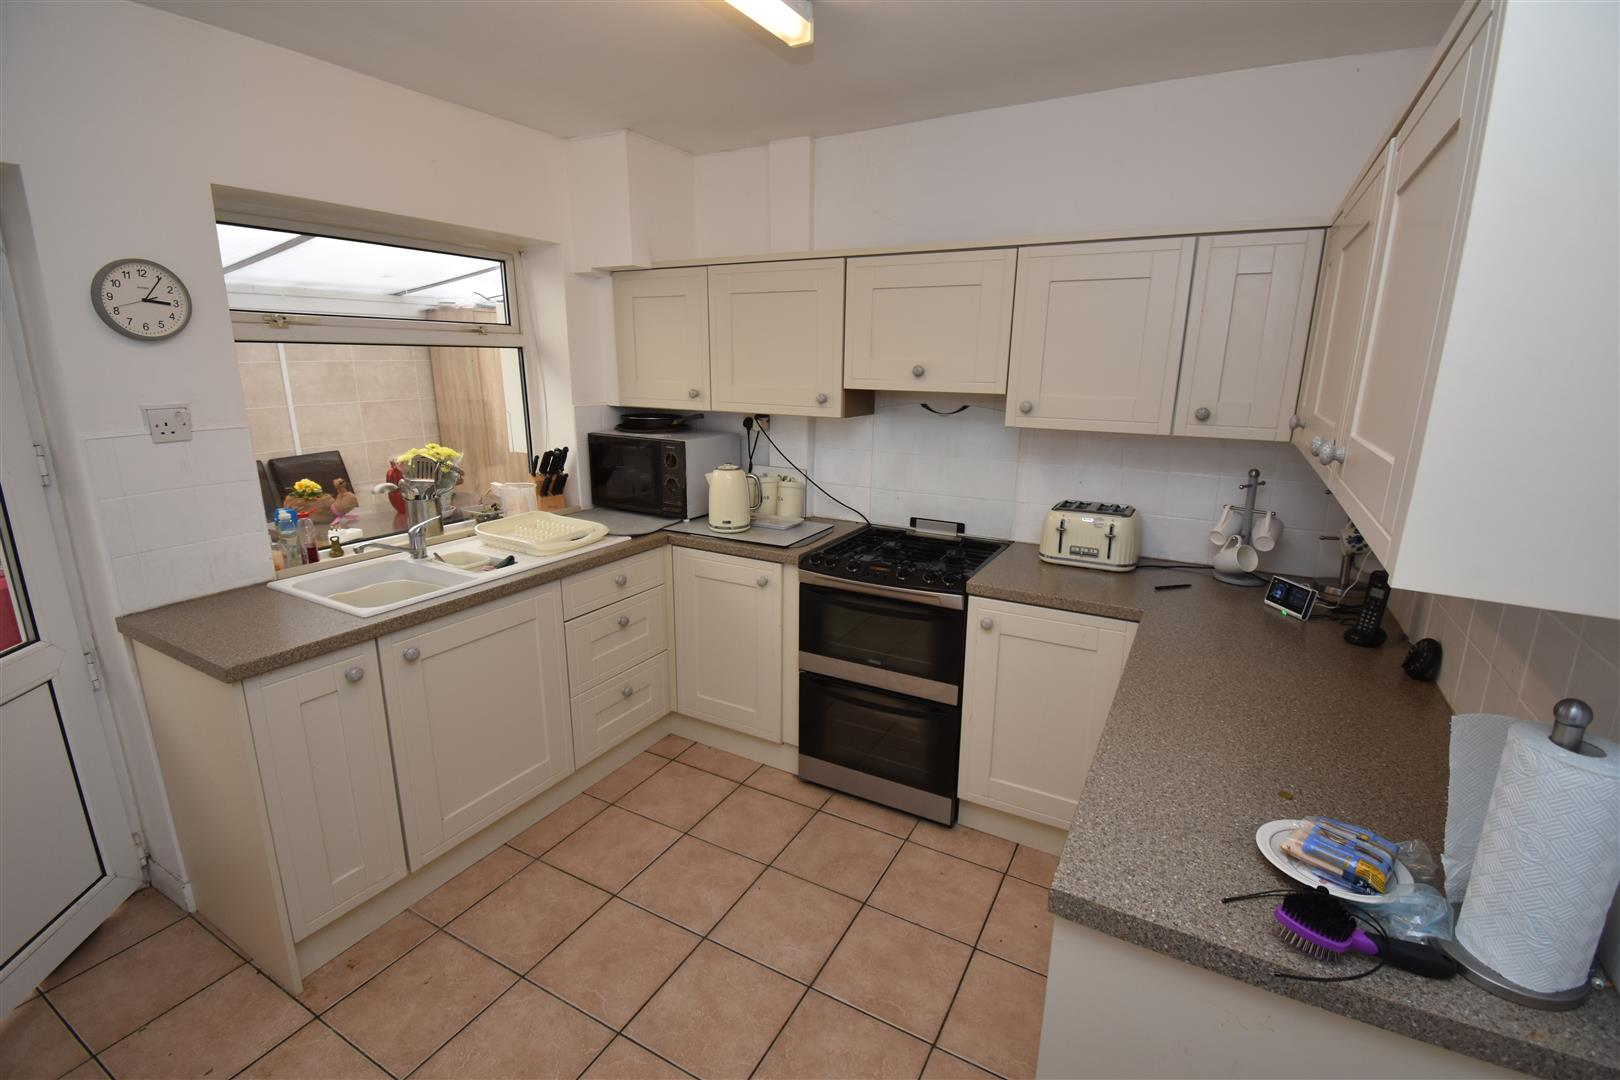 3 bed bungalow for sale in Heath Way, Birmingham 3